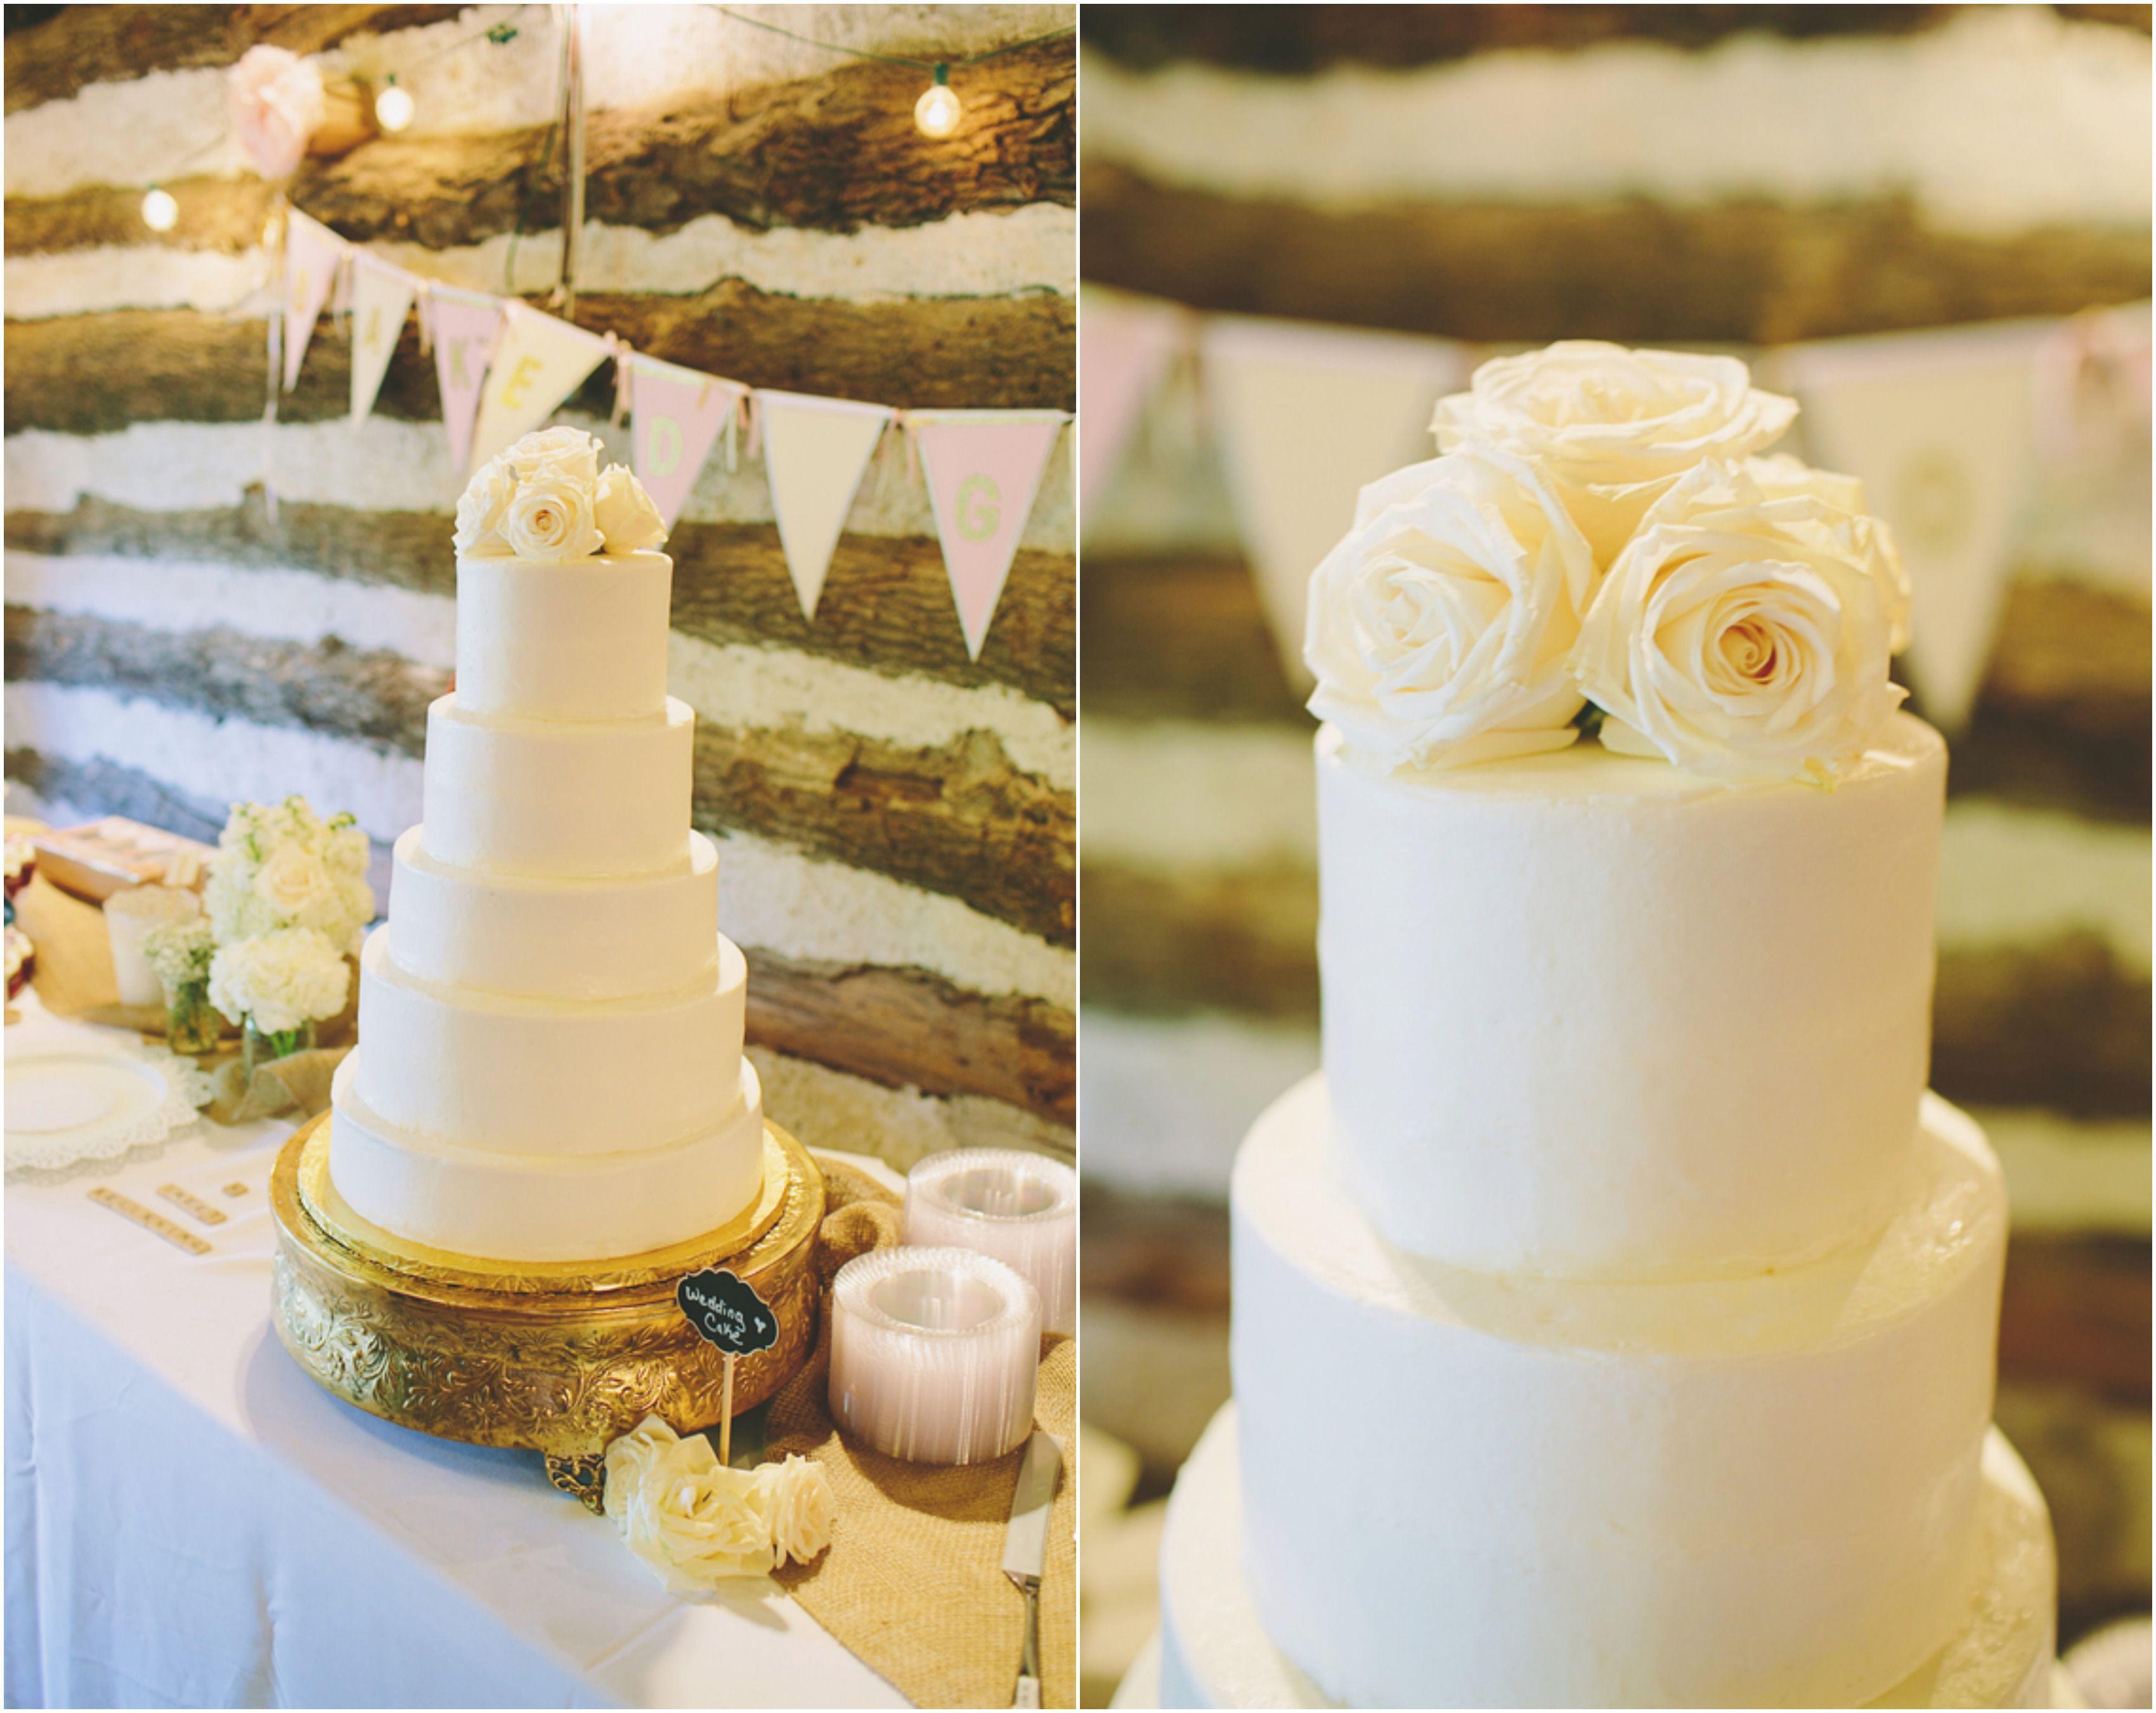 Southern Barn Wedding At Vive Le Ranch - Rustic Wedding Chic